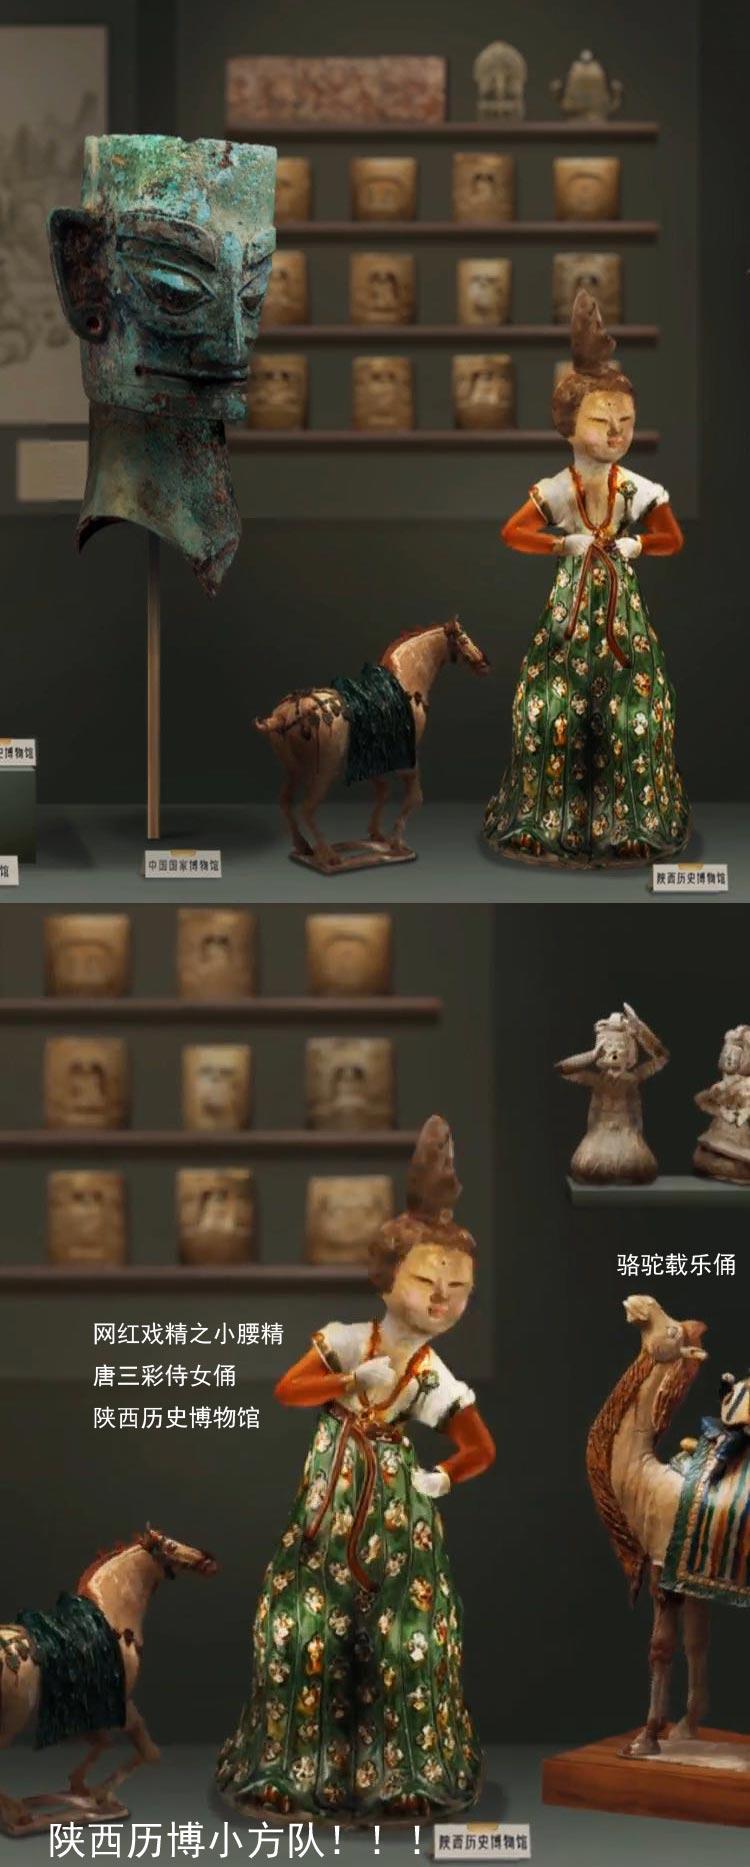 museum180518g